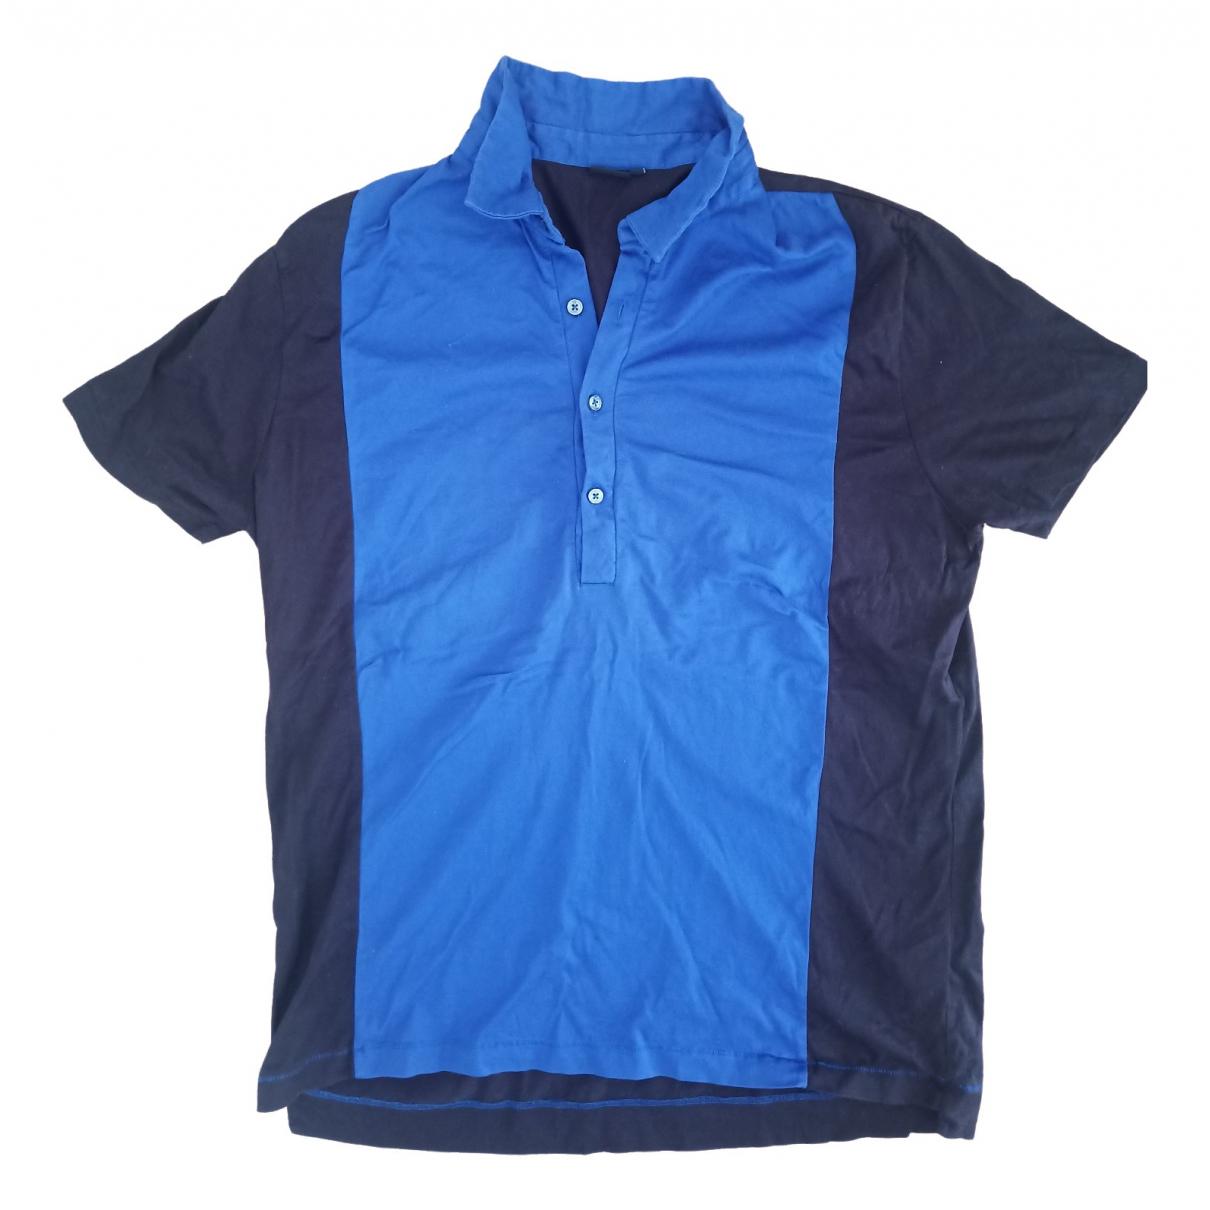 Paul Smith \N Poloshirts in  Blau Baumwolle